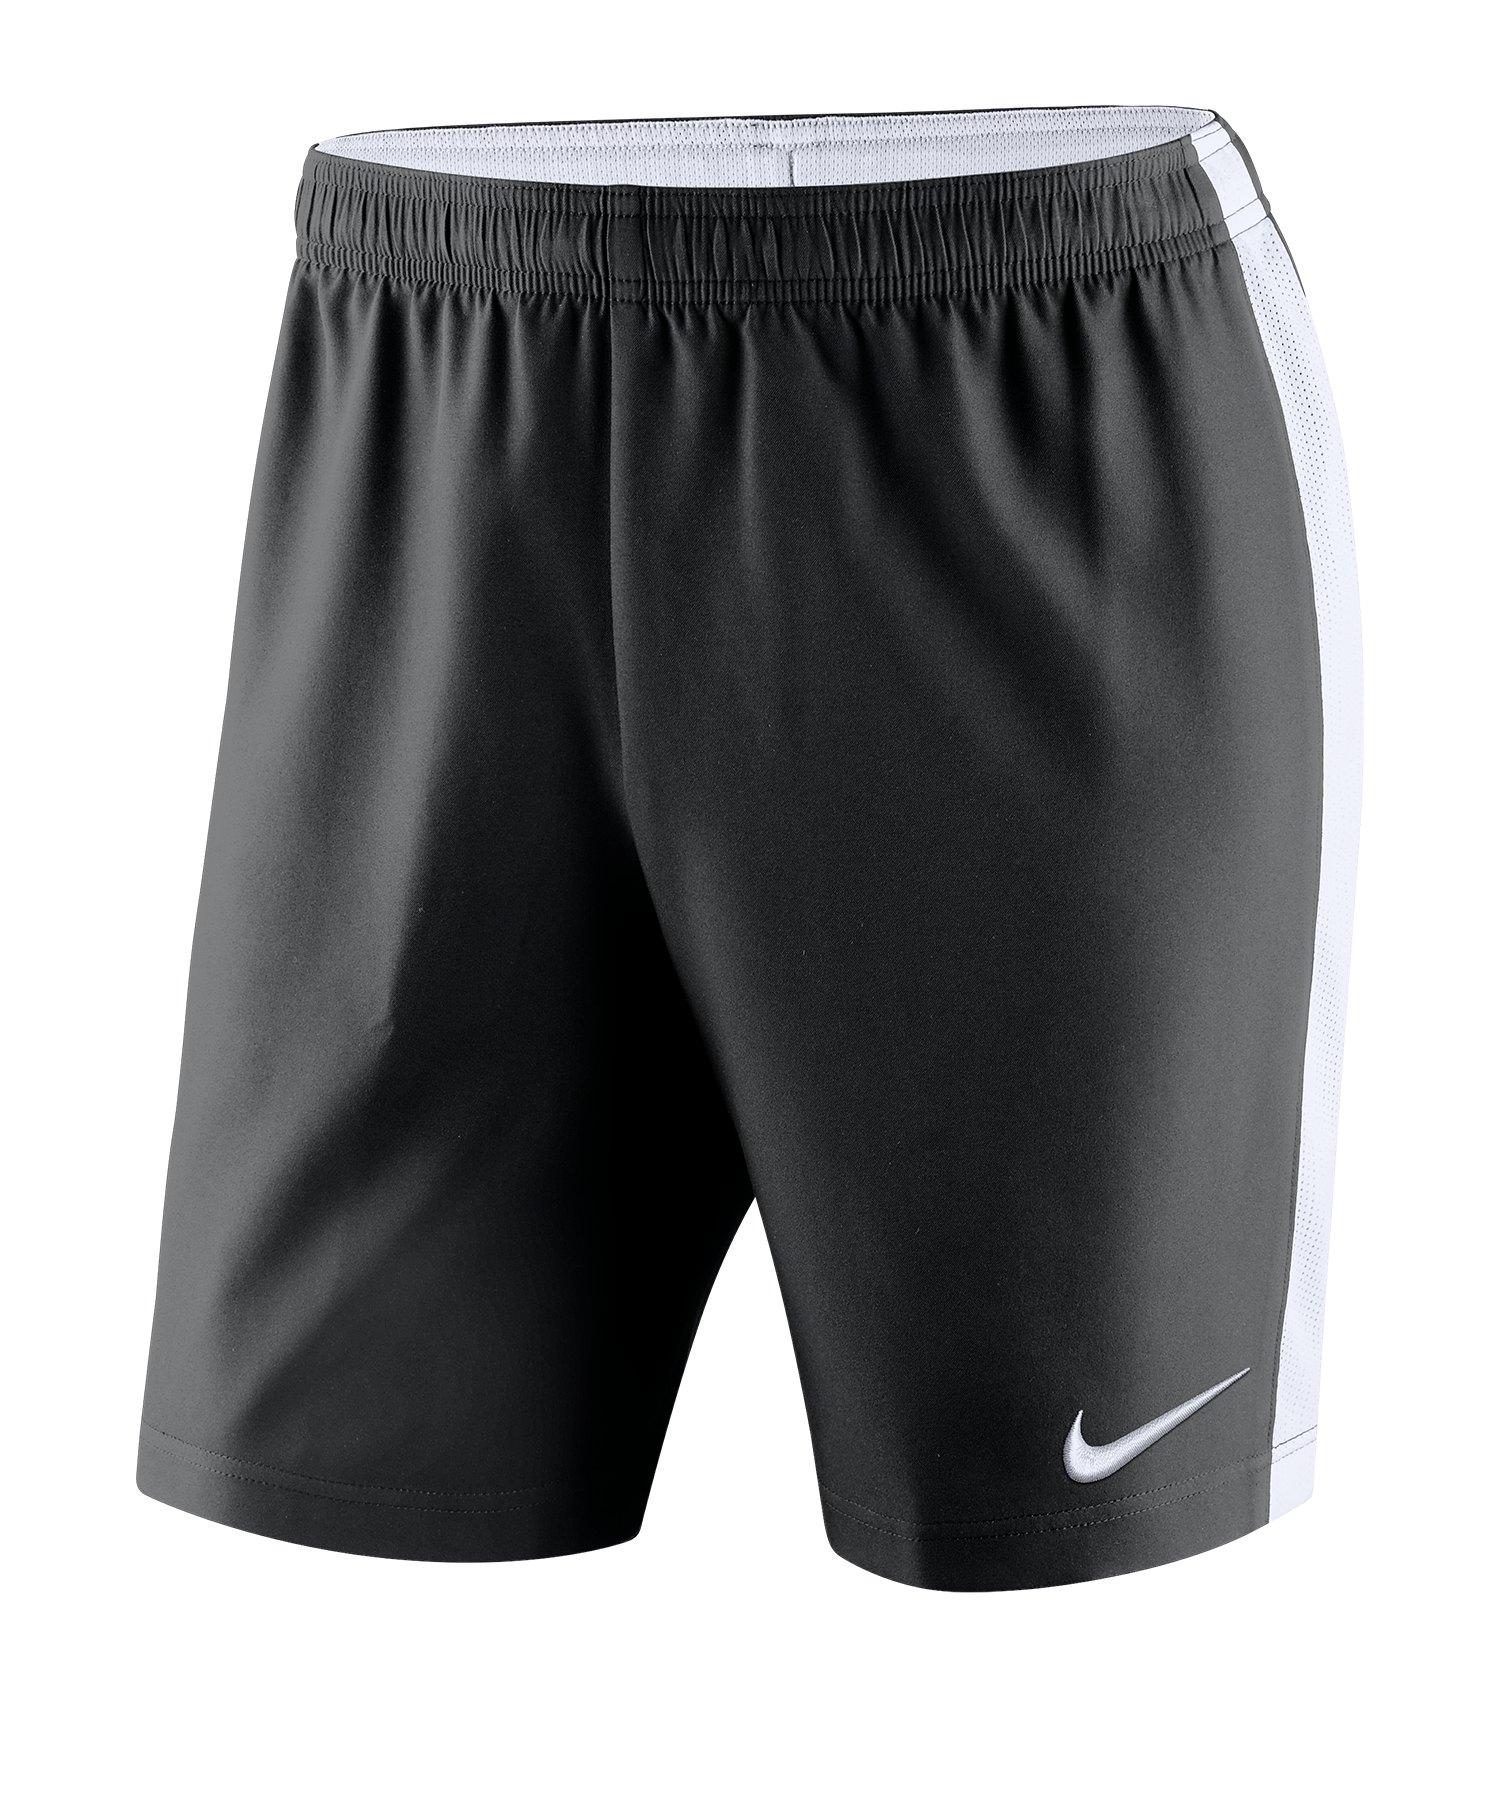 adidas F50 Woven Trainingshose kurz Kinder black white